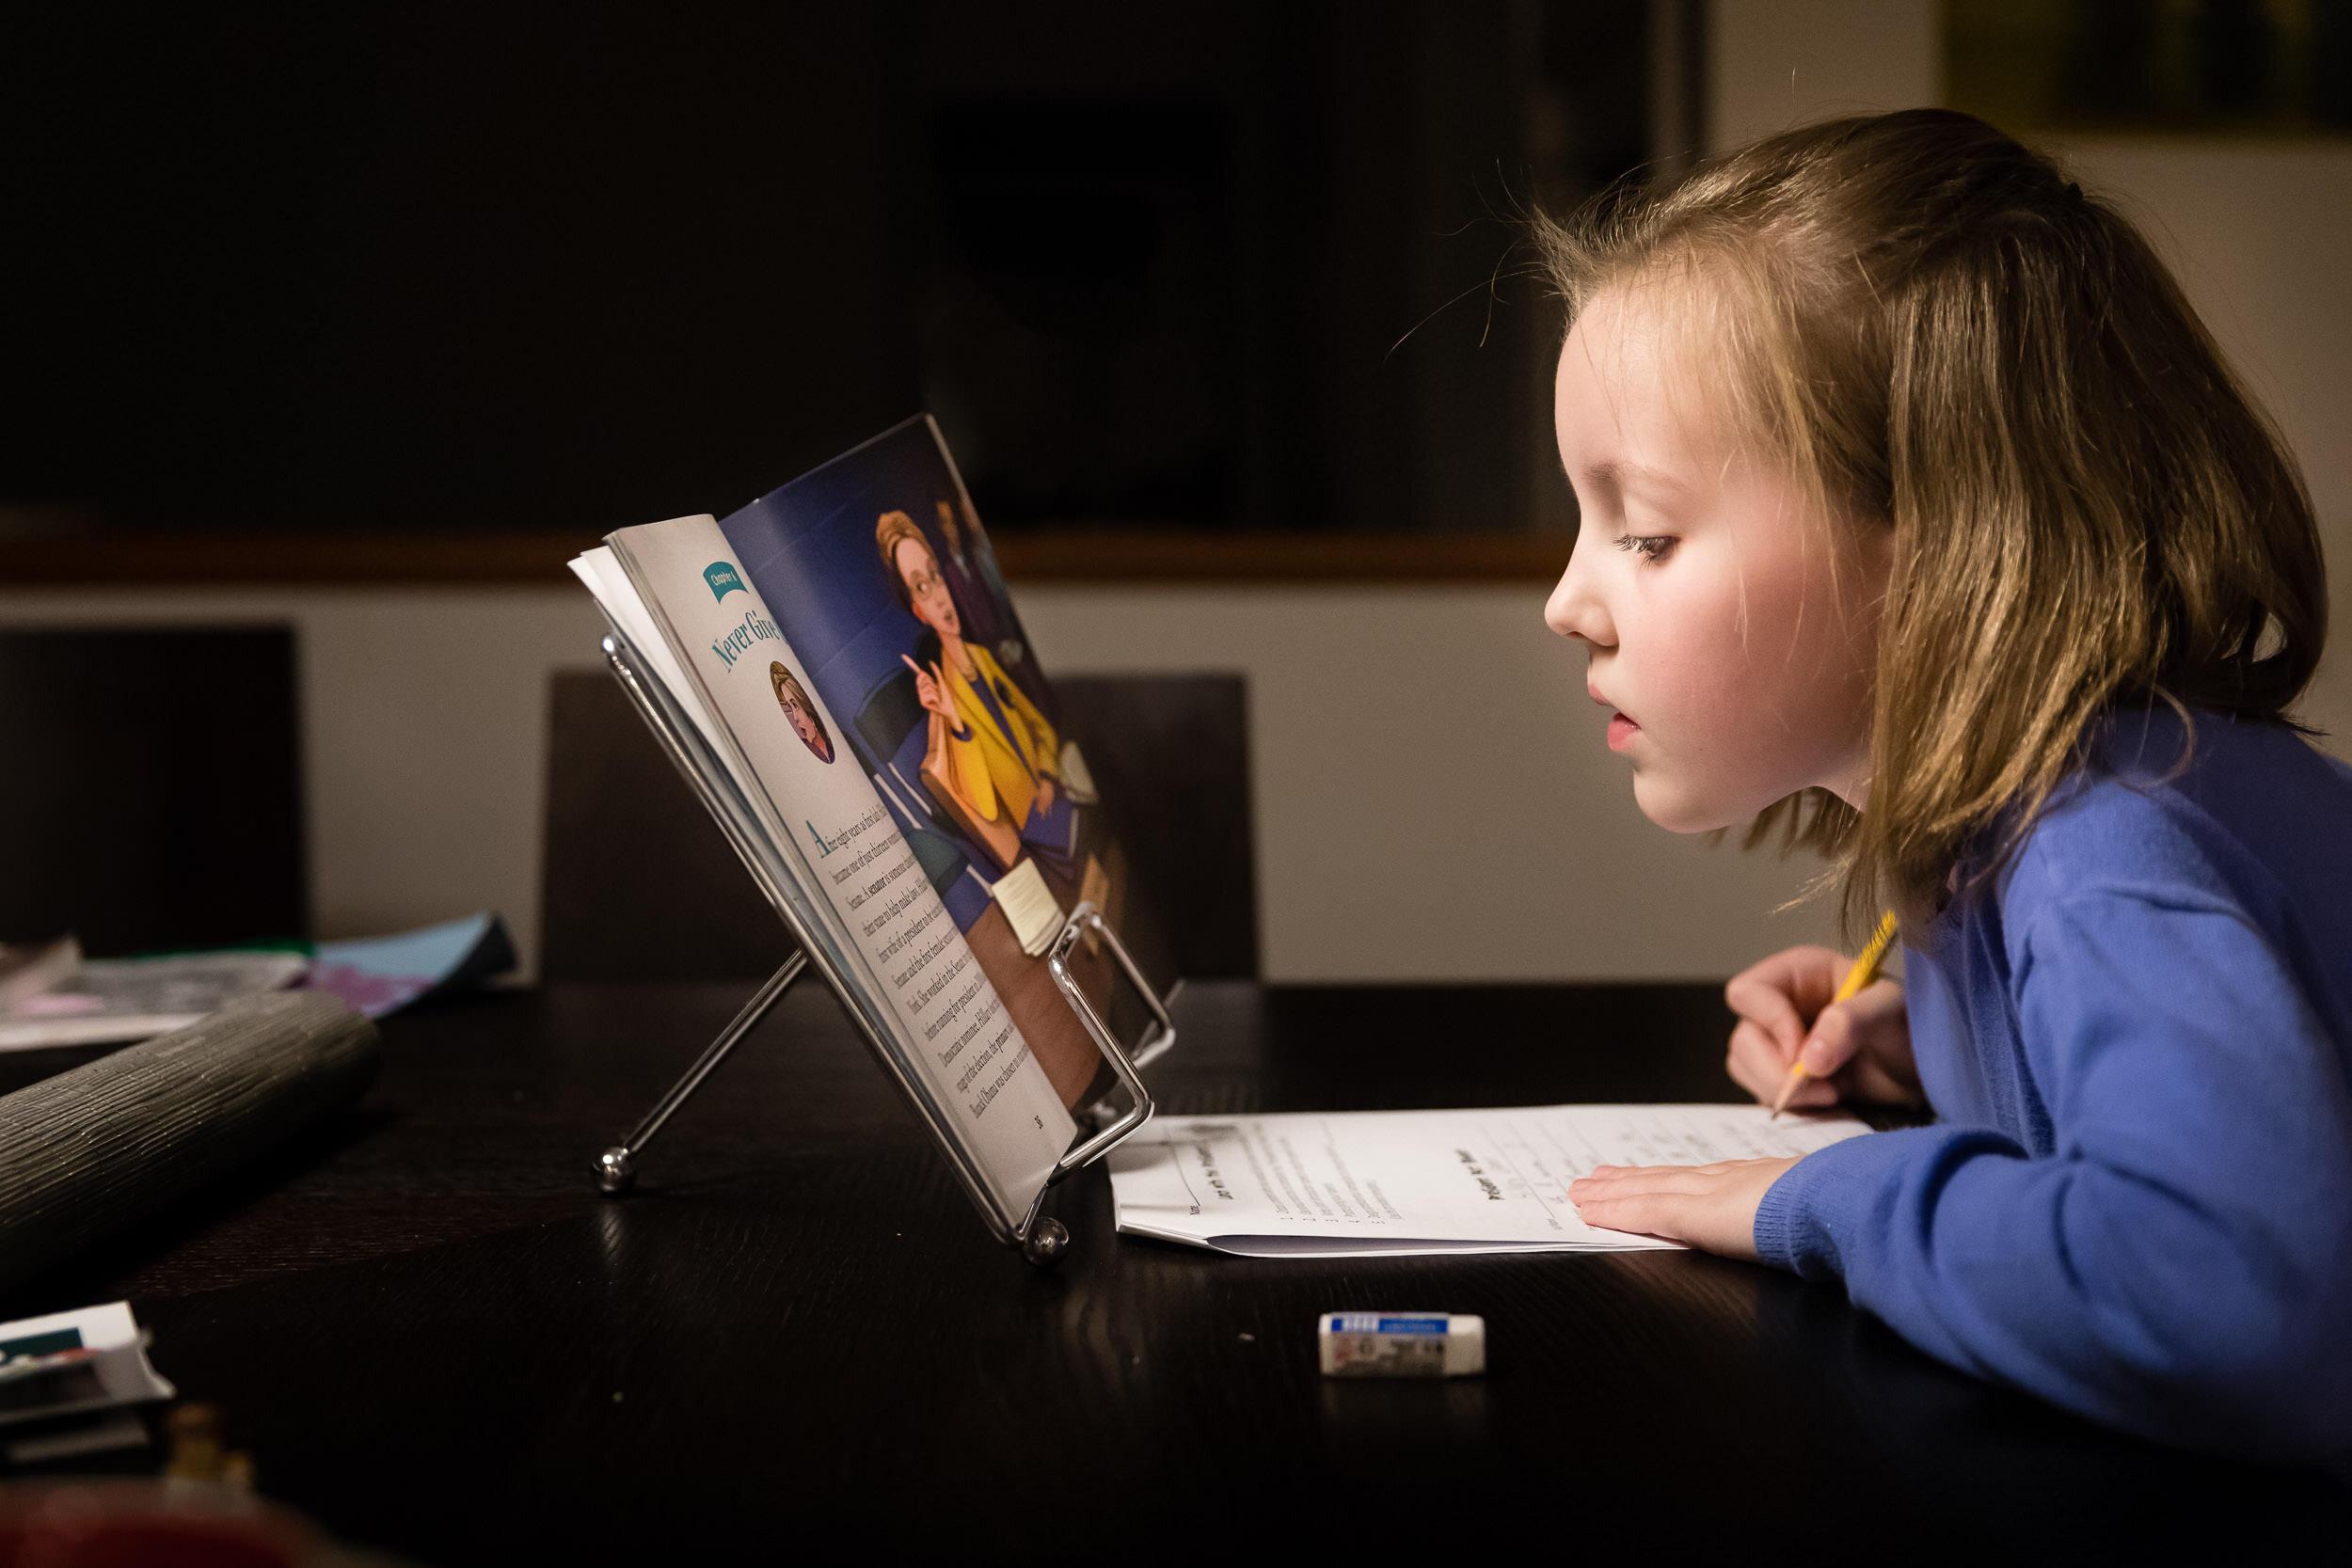 doing-homework-at-Home-photography-family-photo-session-portland-oregon-rebecca-hunnicutt-farren-25.jpg